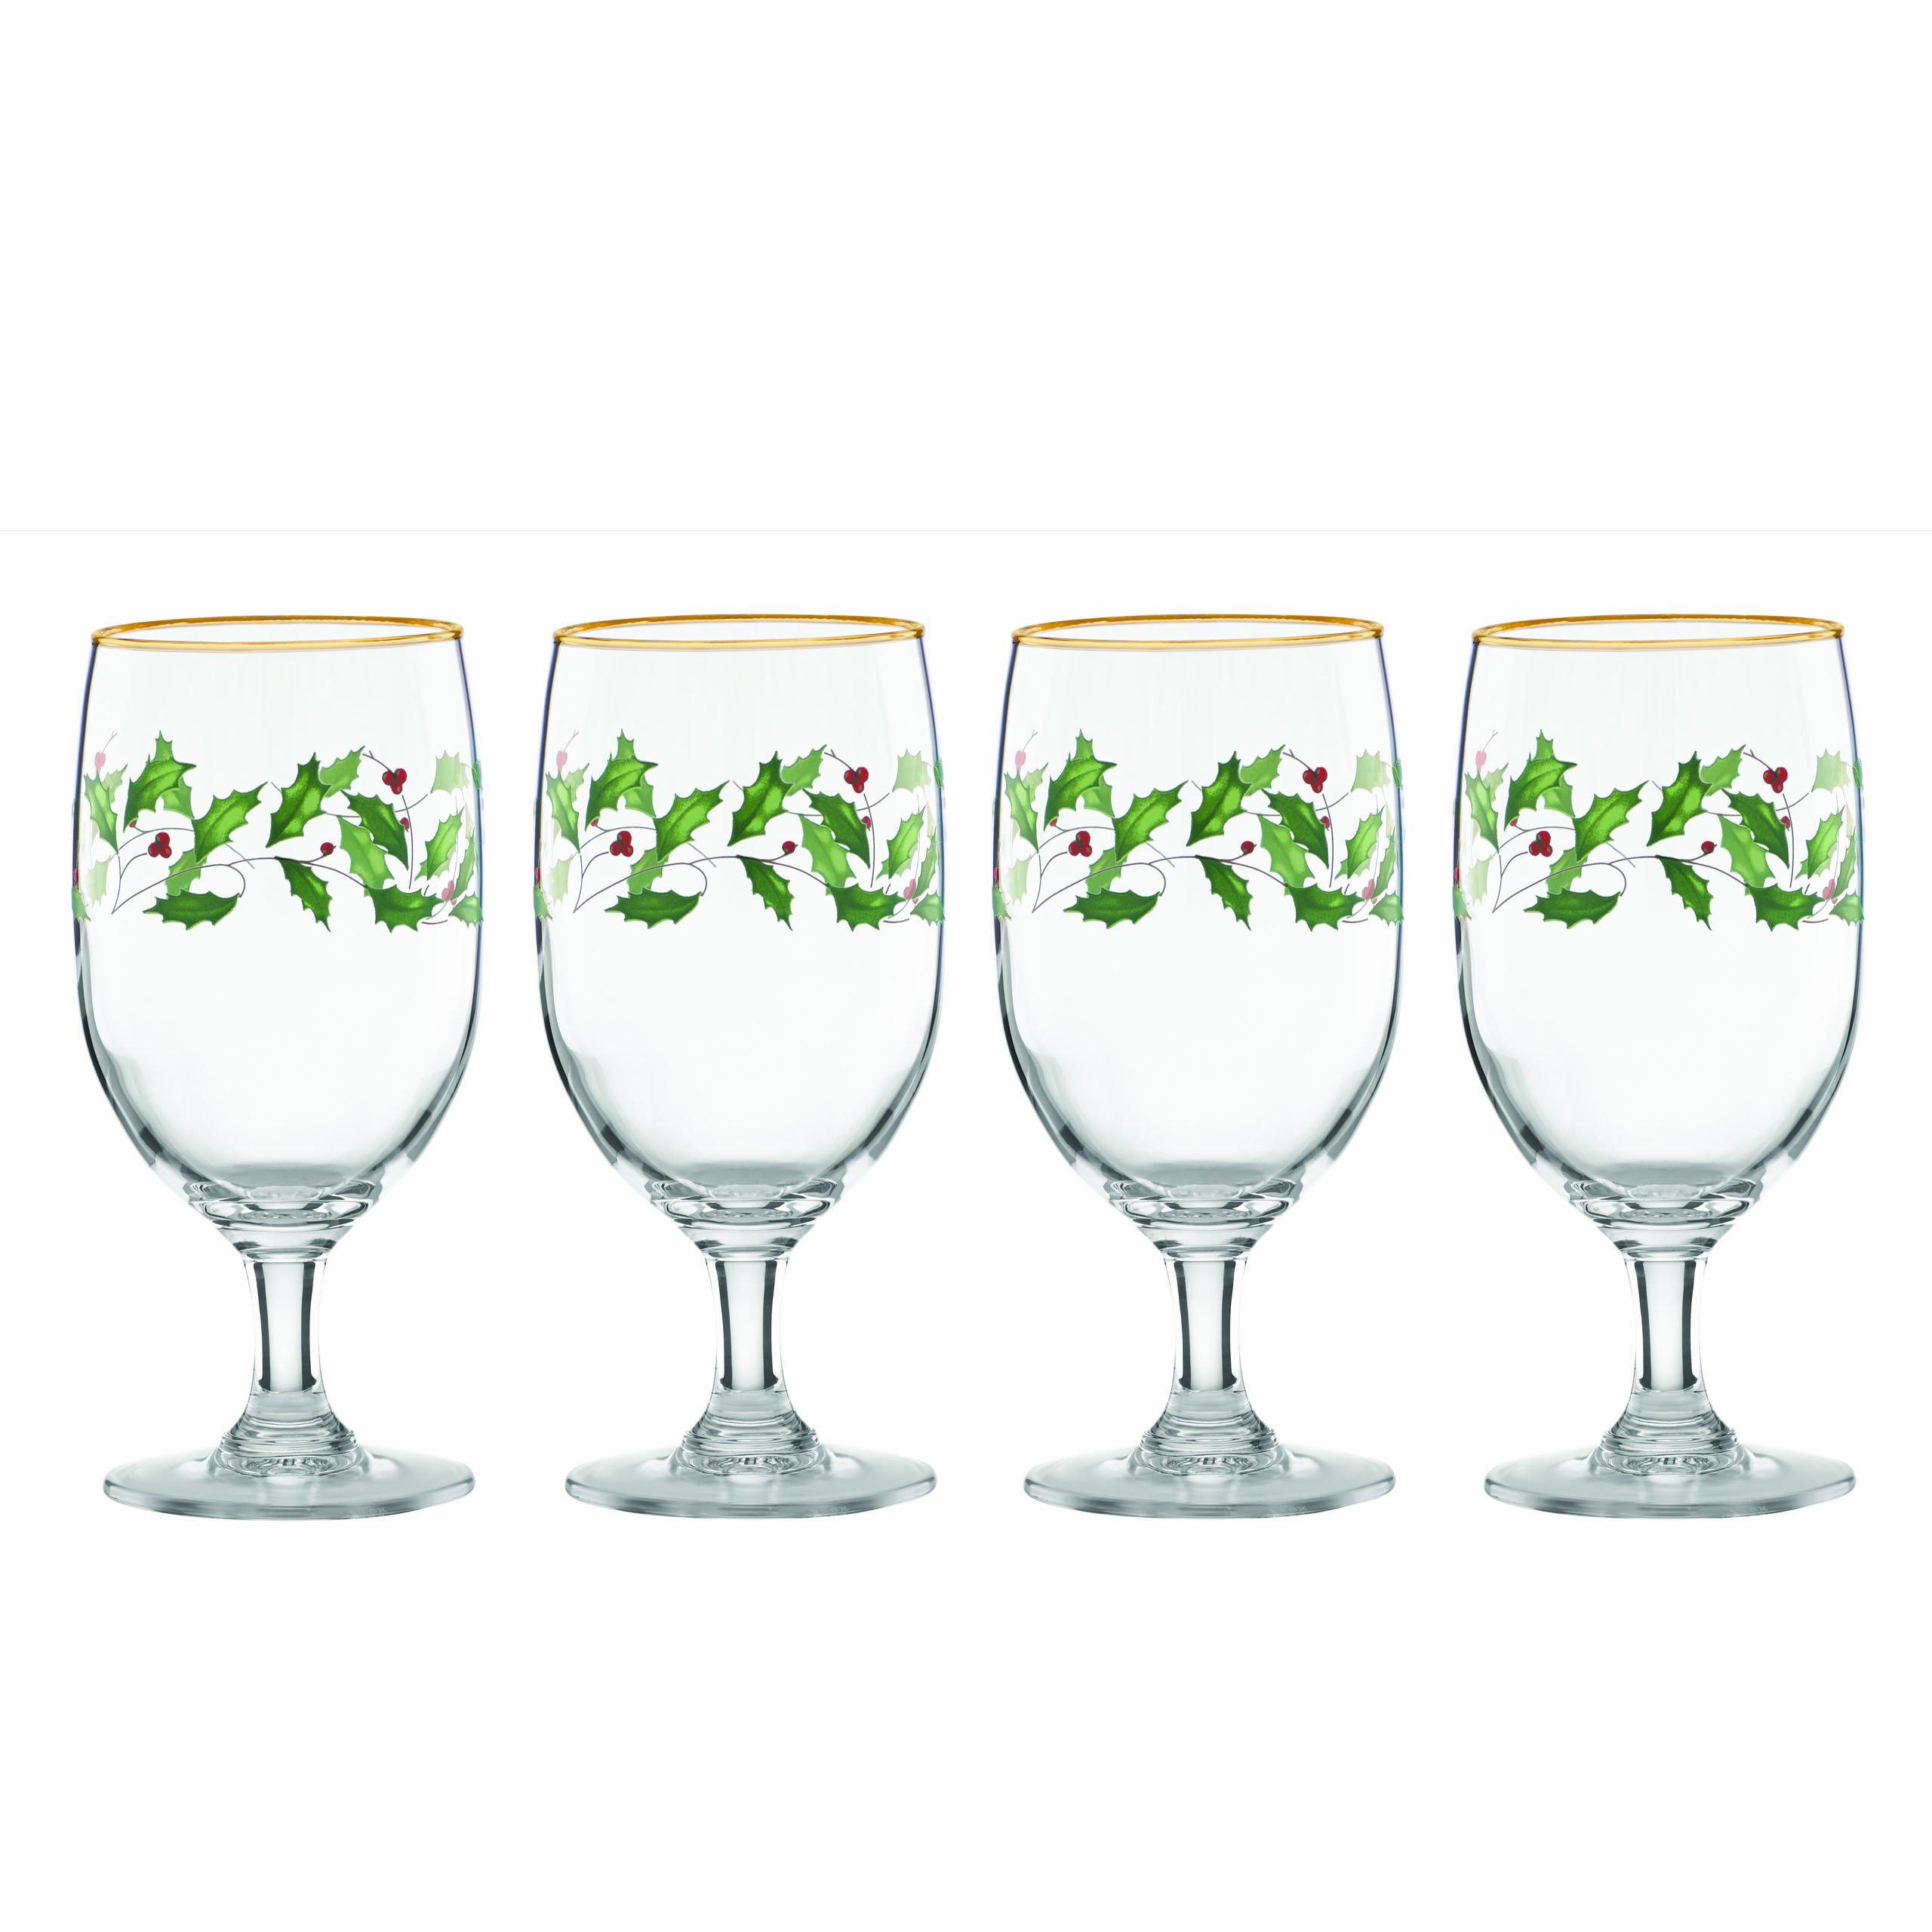 Lenox Holiday Iced Beverage Glasses, Set of 4